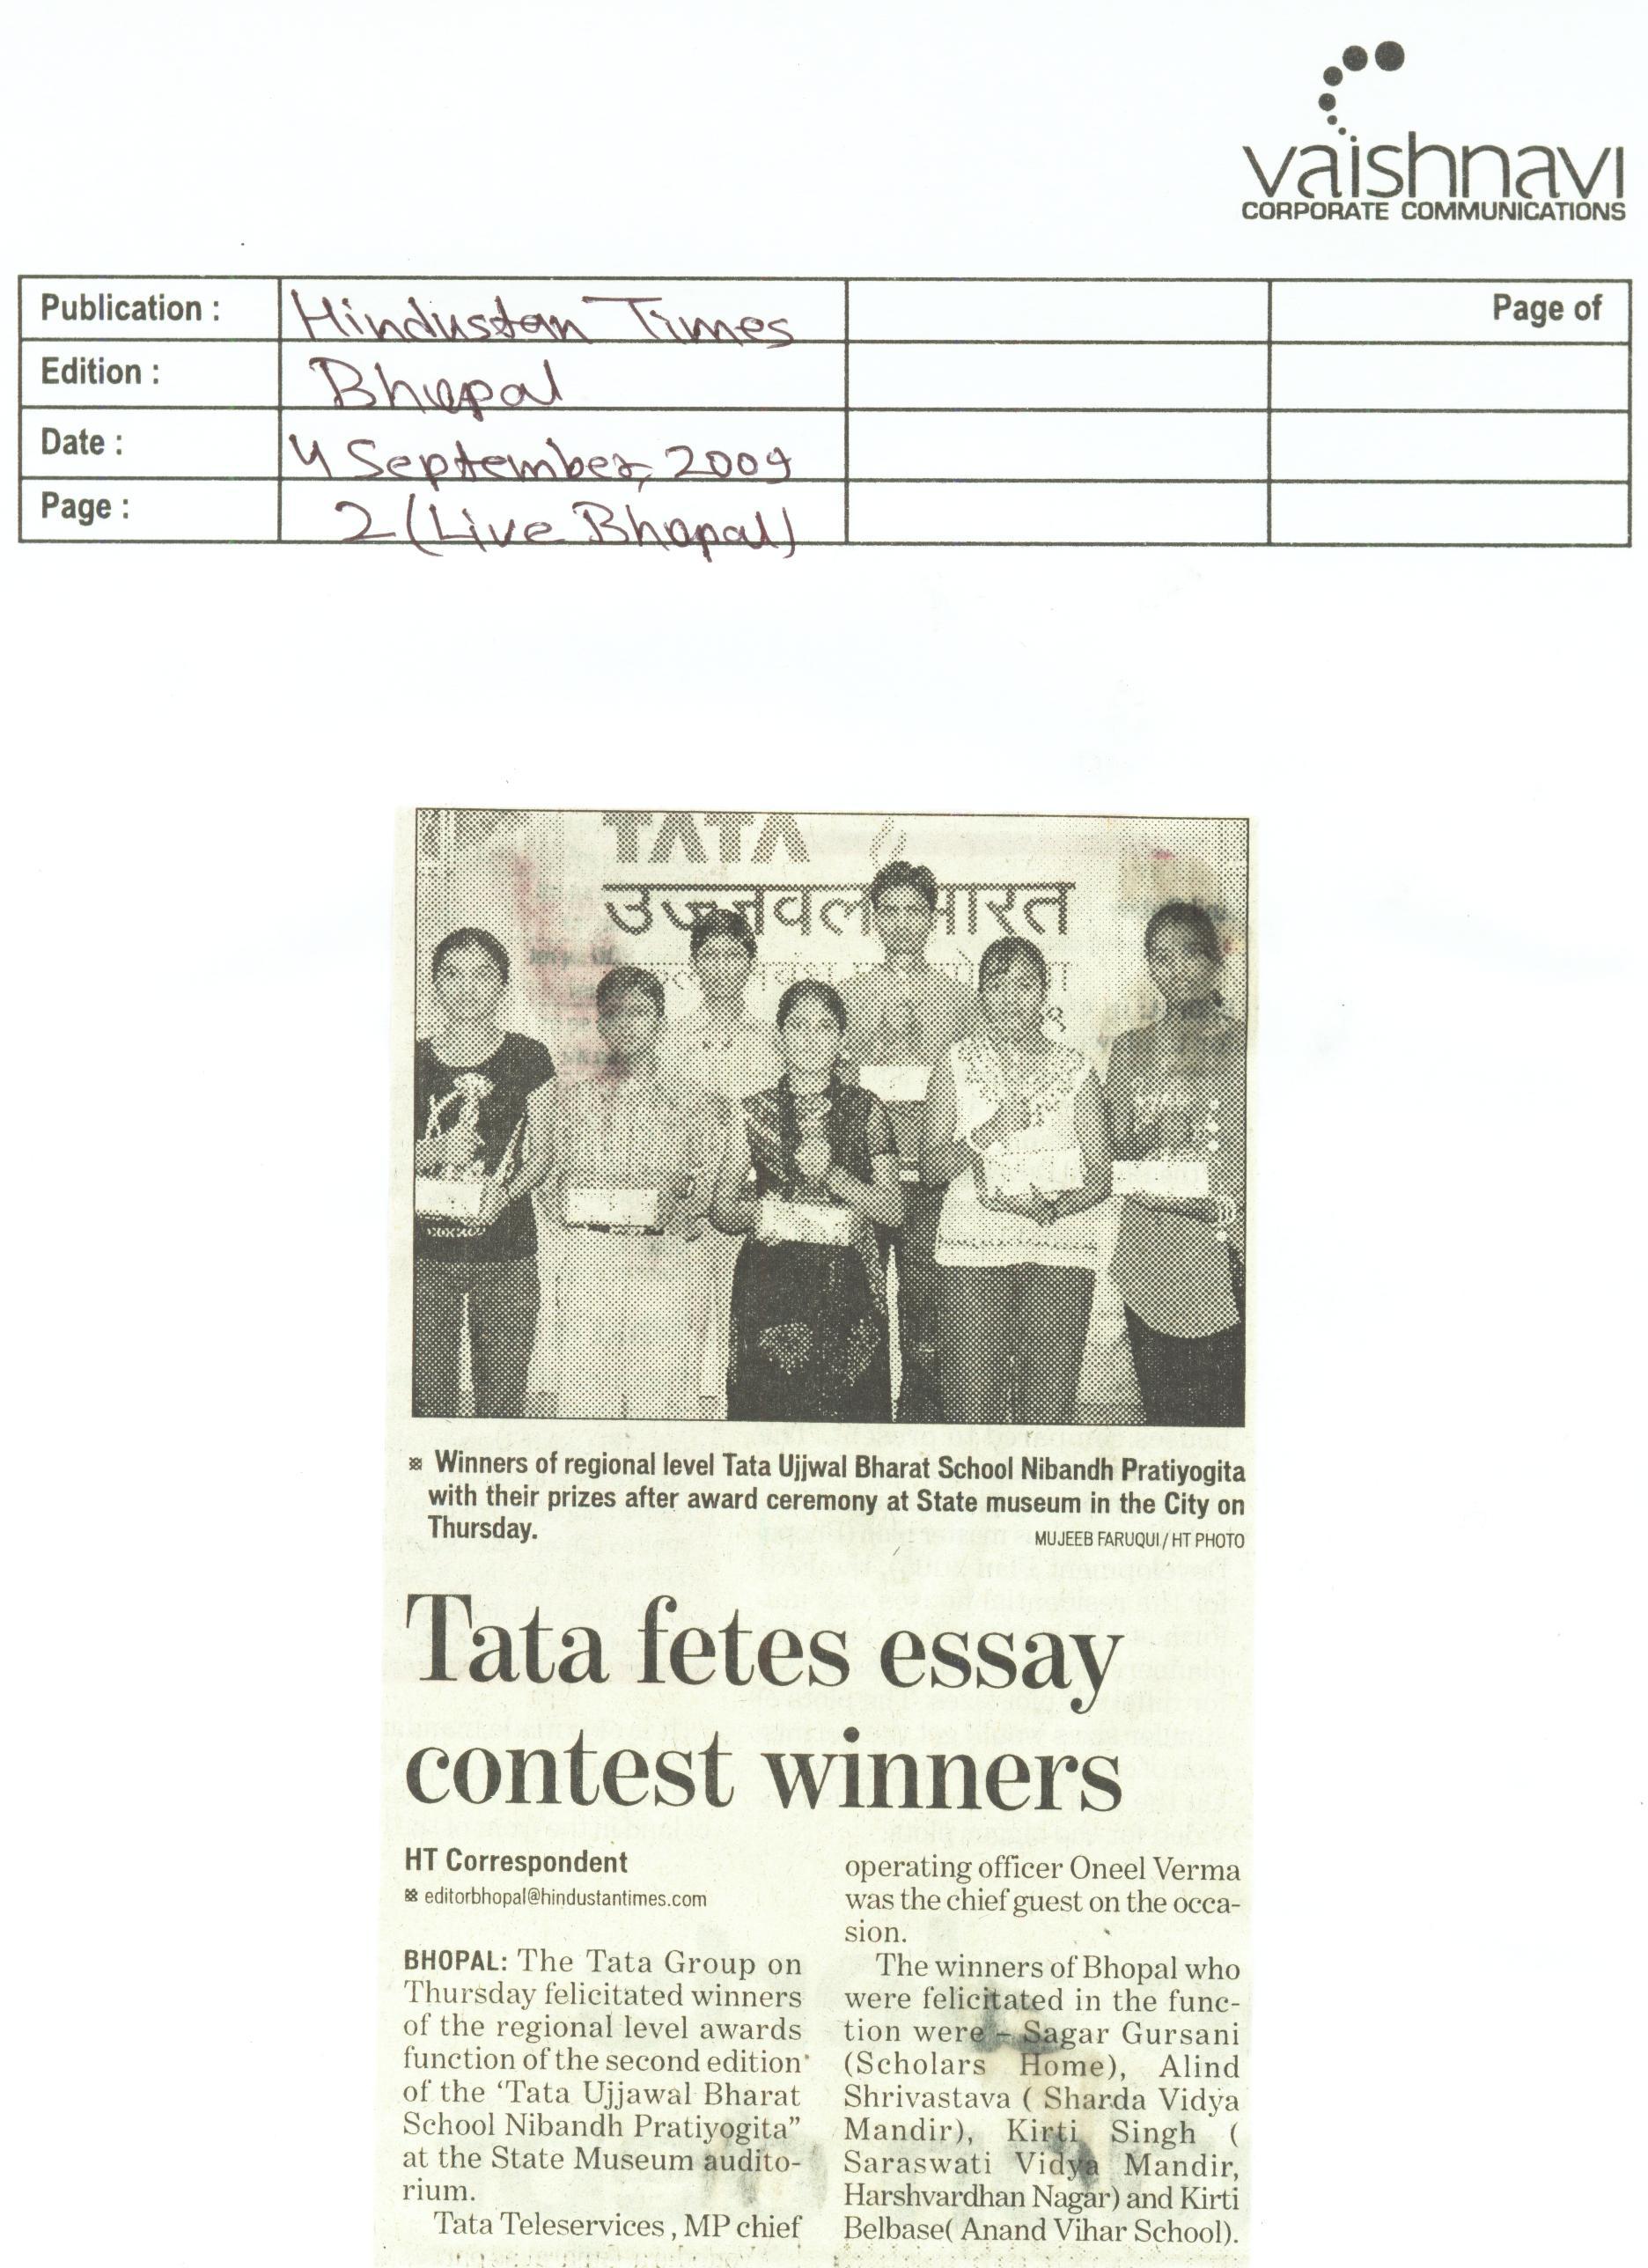 ayn rand anthem essay contest winners 2013